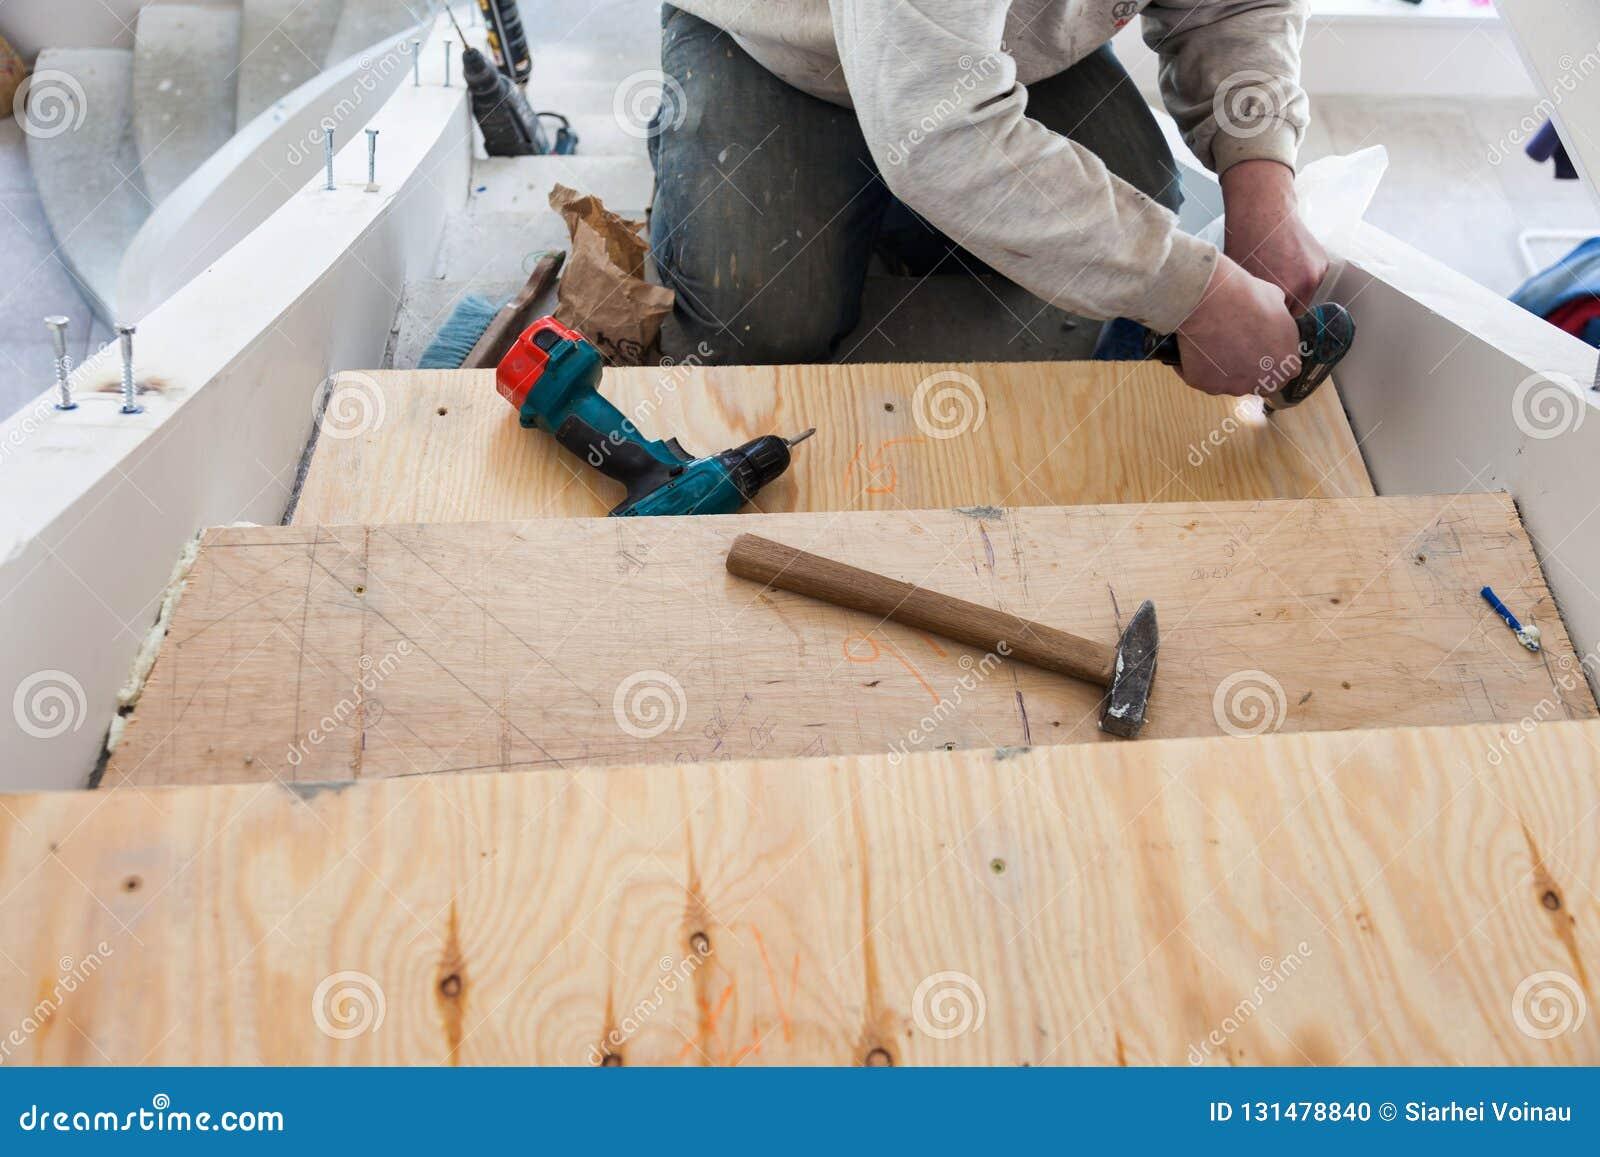 Продукция и установка льна Работа мастера